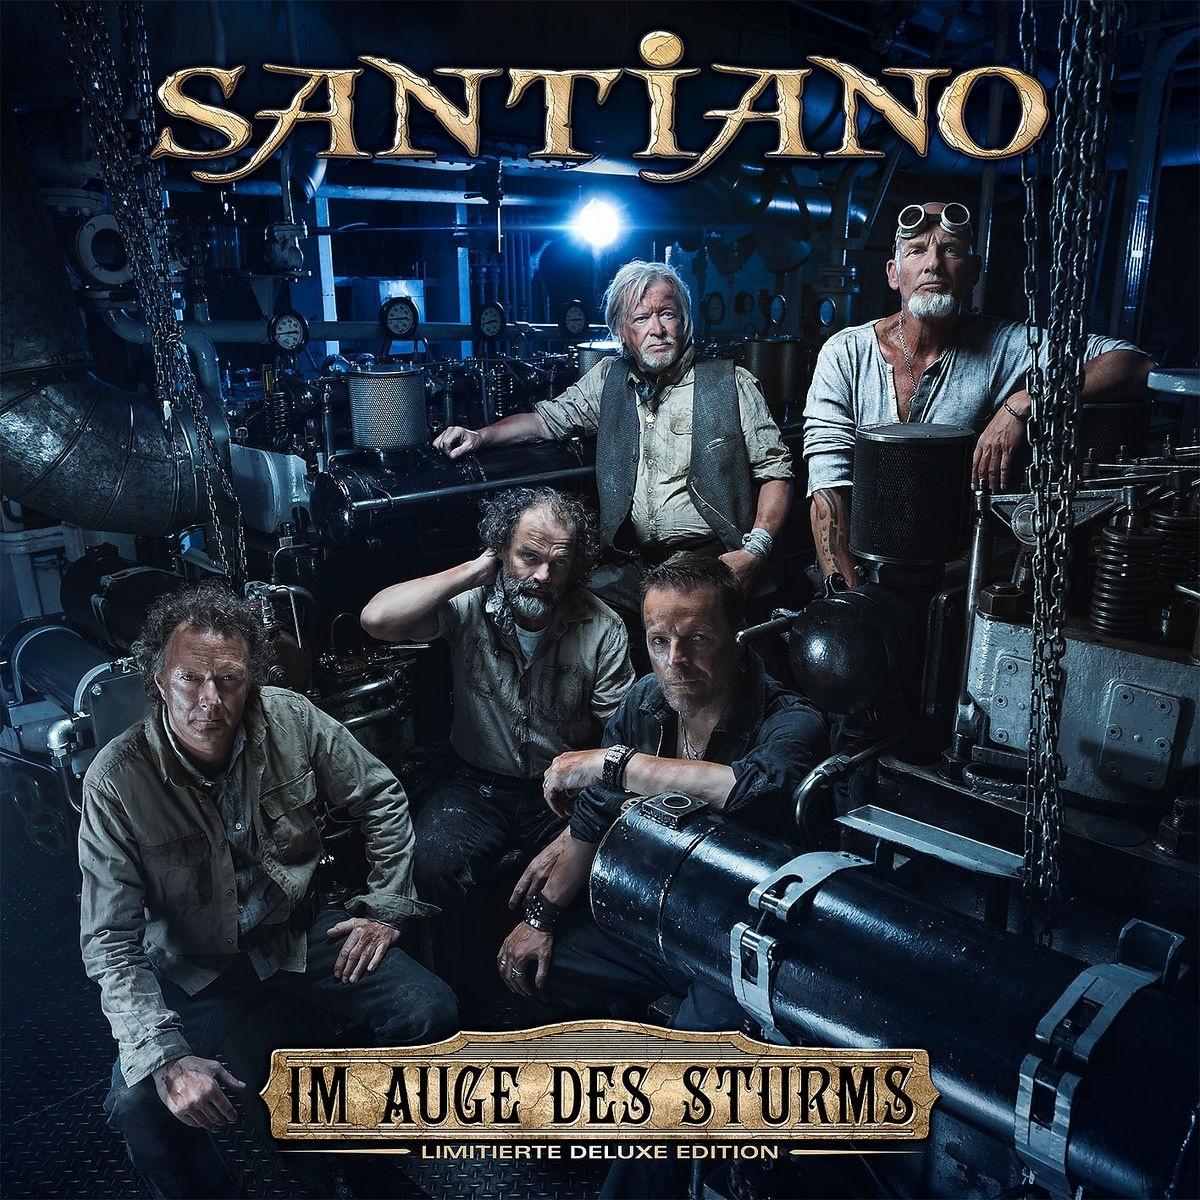 Im Auge des Sturms Limitierte Deluxe Edition von Santiano